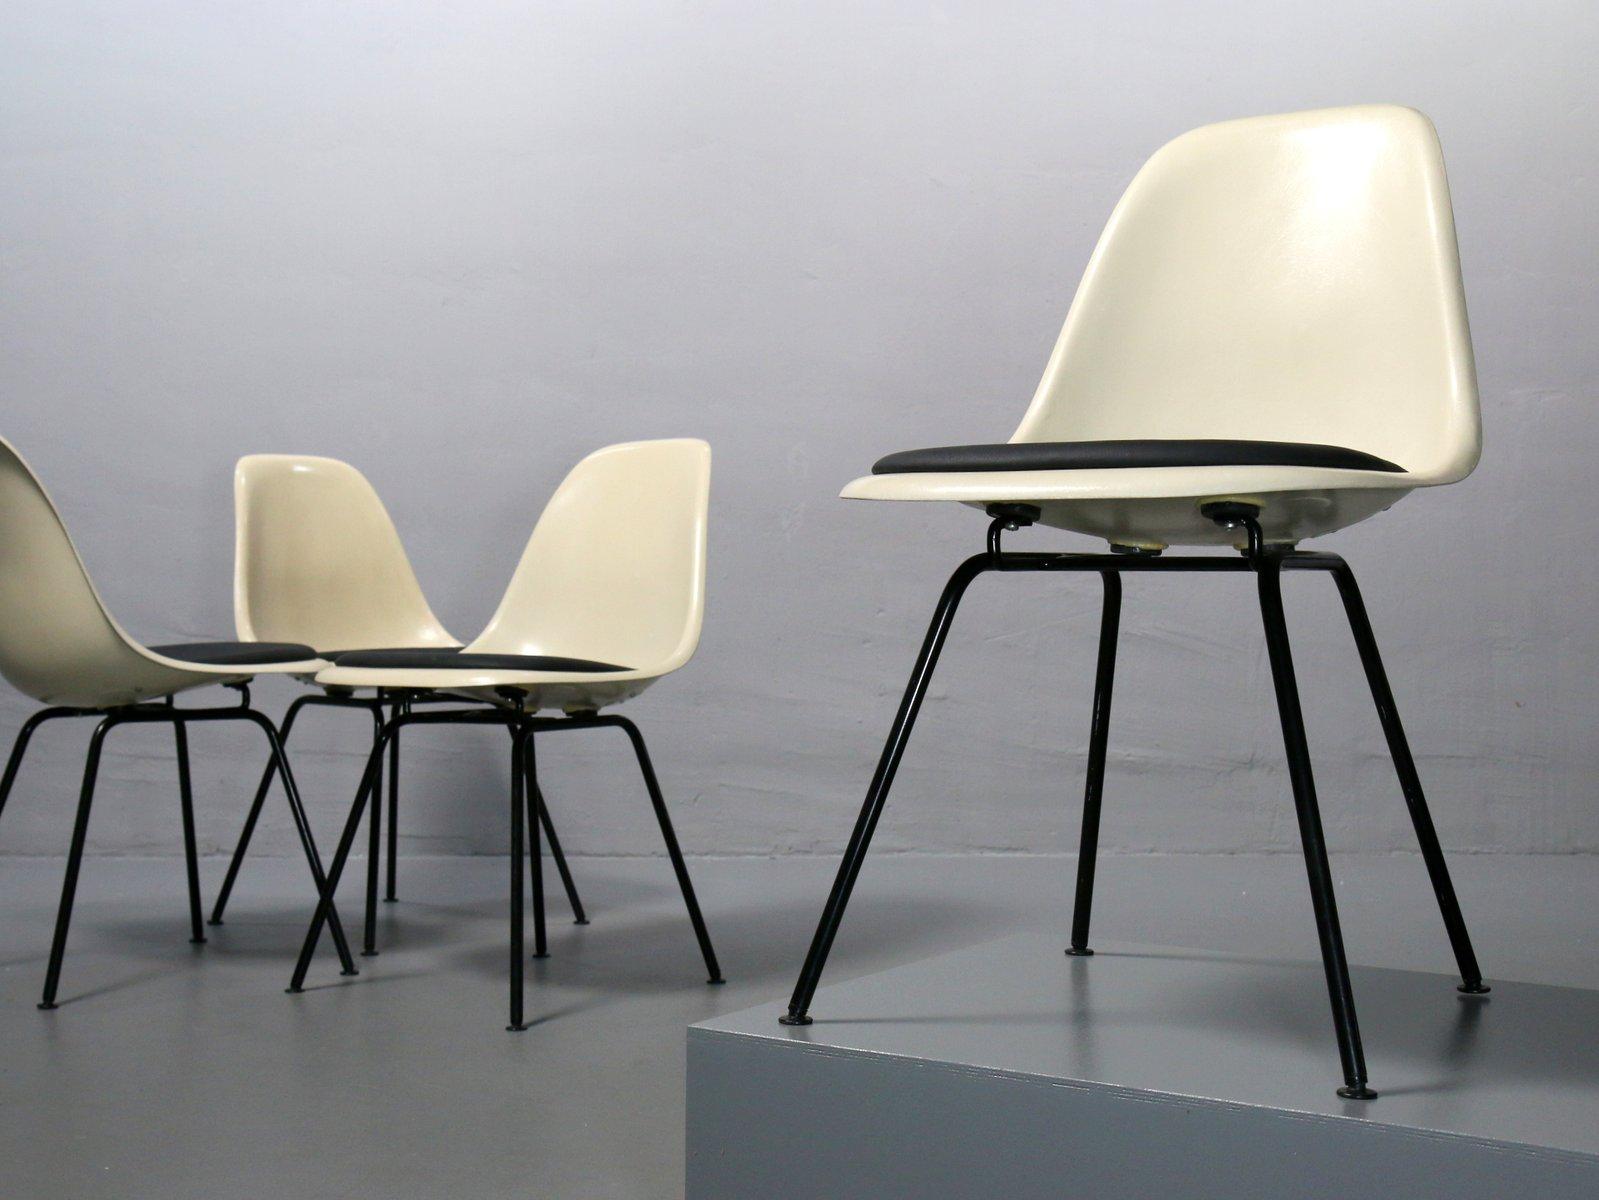 dsx fiberglas st hle von charles ray eames f r vitra 1980er 4er set bei pamono kaufen. Black Bedroom Furniture Sets. Home Design Ideas